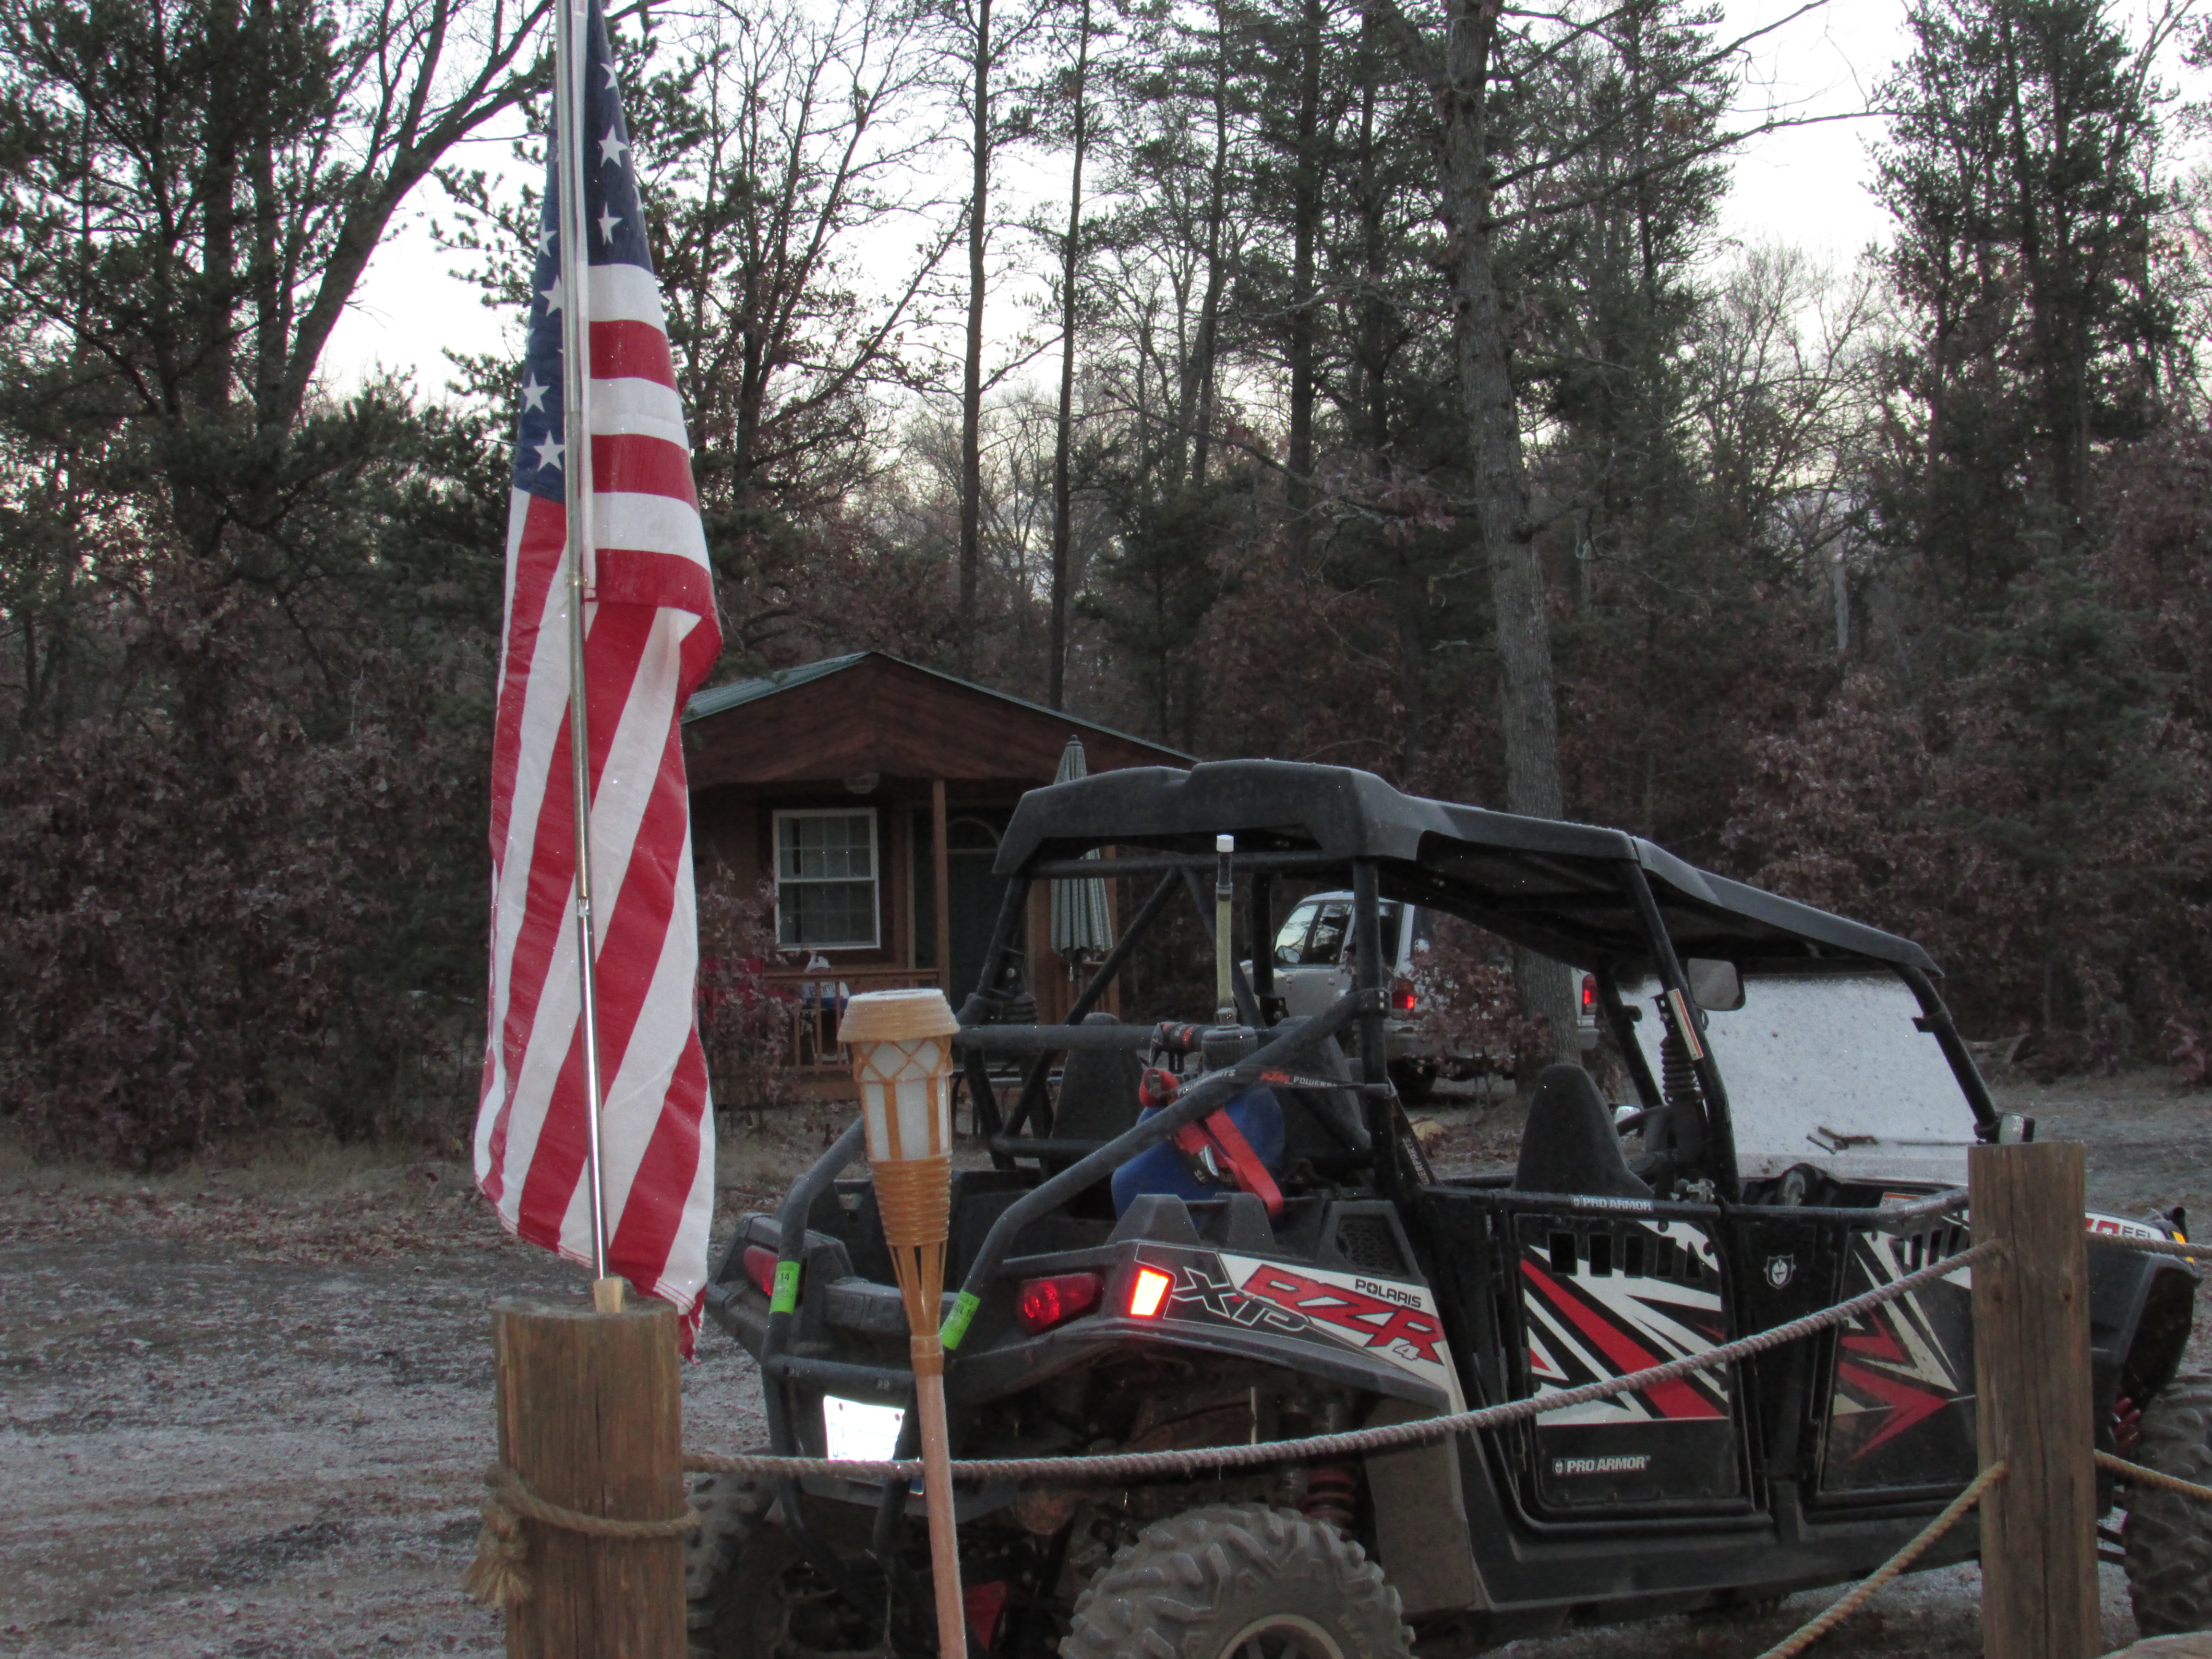 Best Bear Lodge & Campground Baldwin/Irons Area image 19